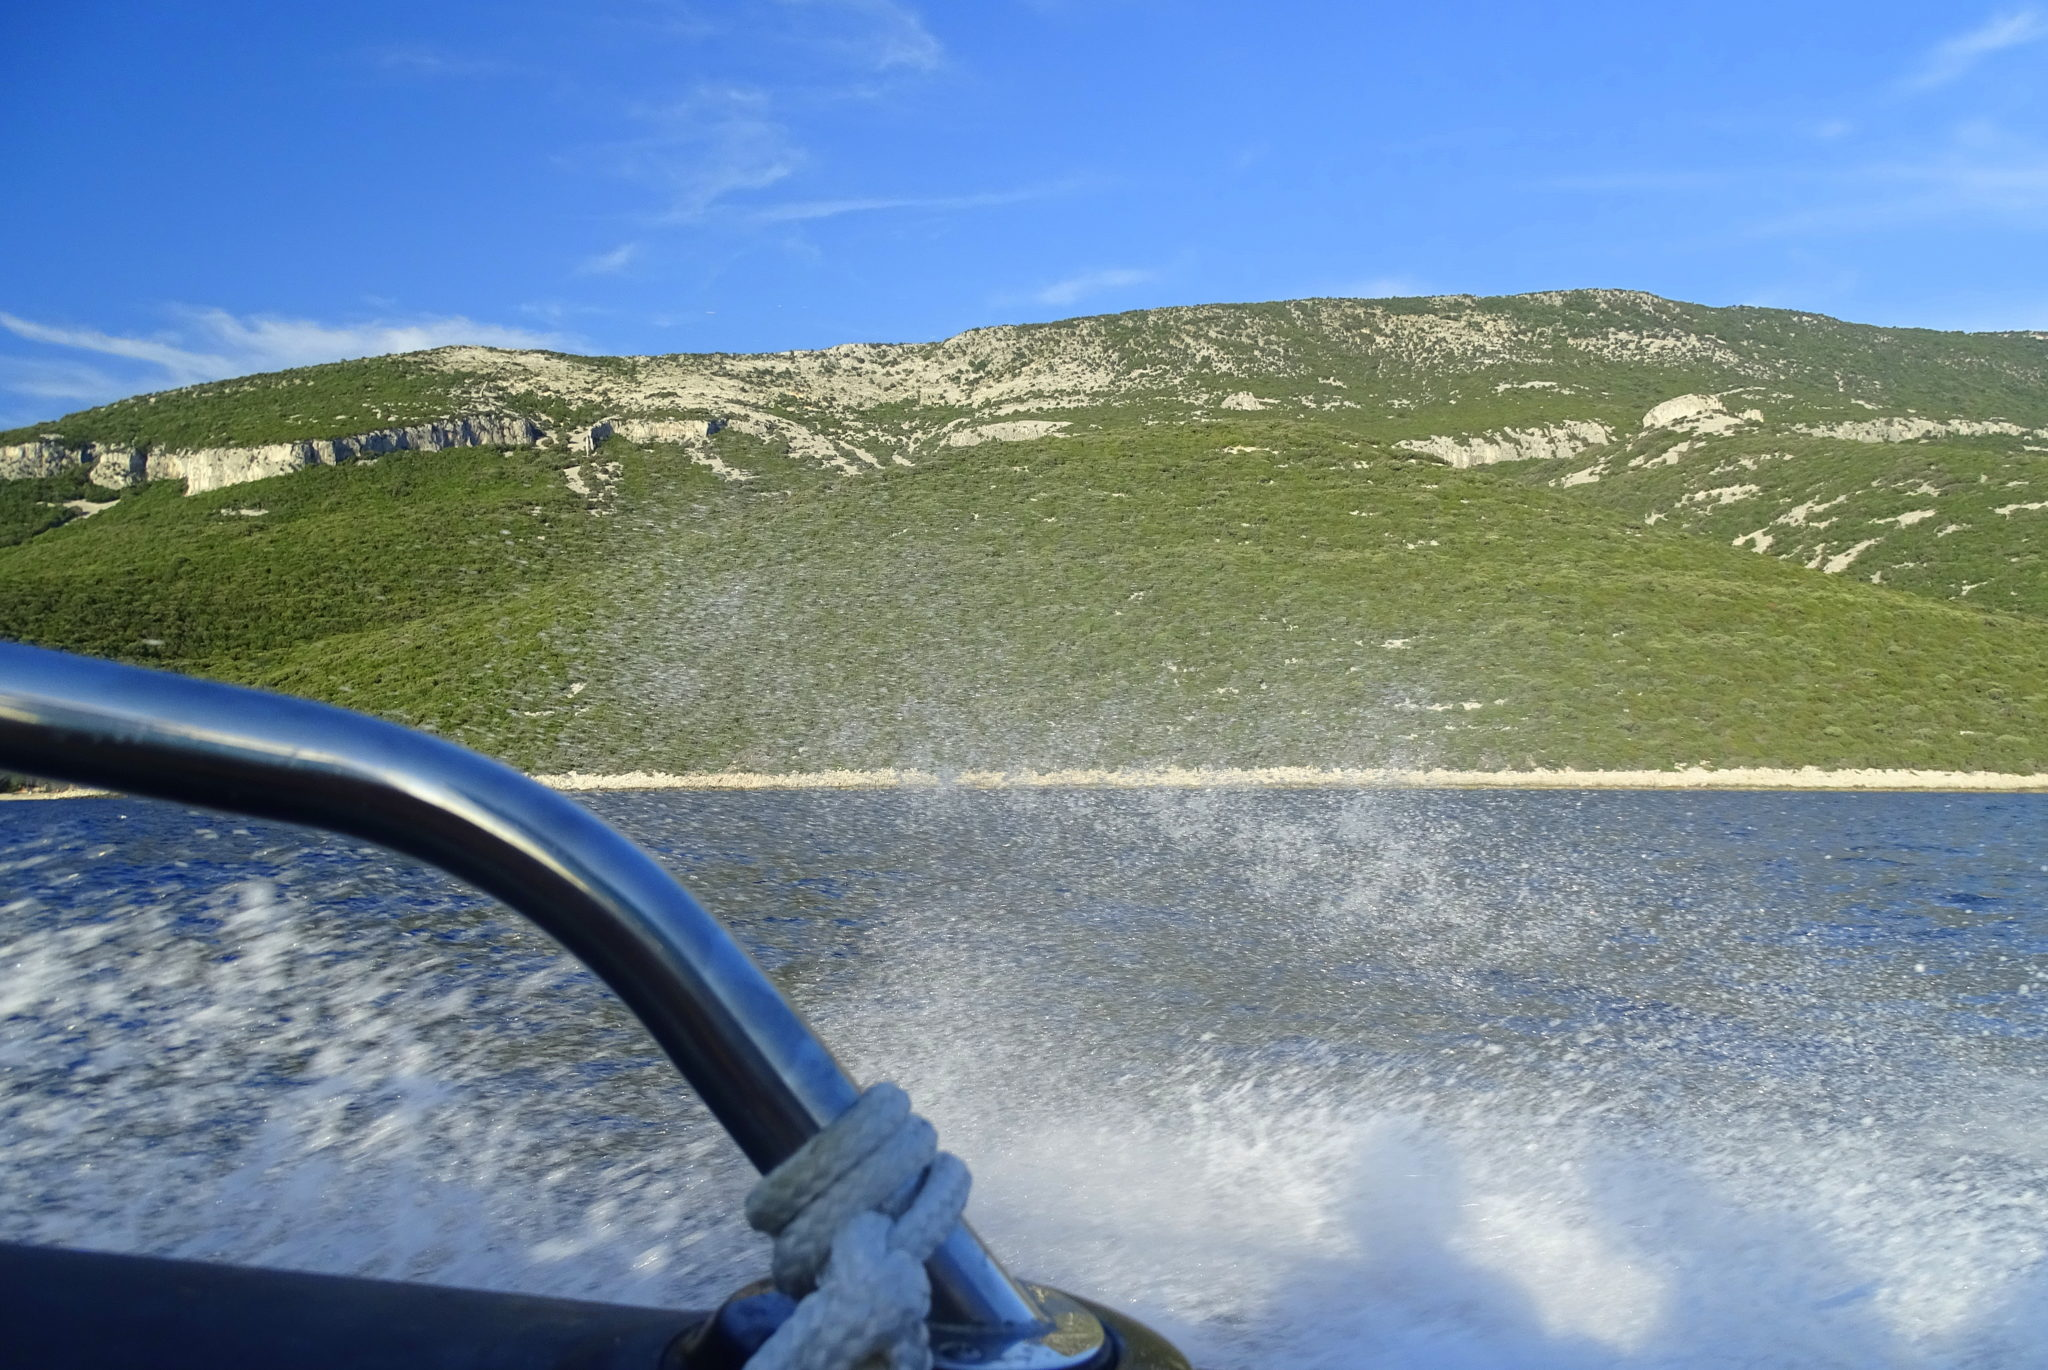 Boating around Lošinj